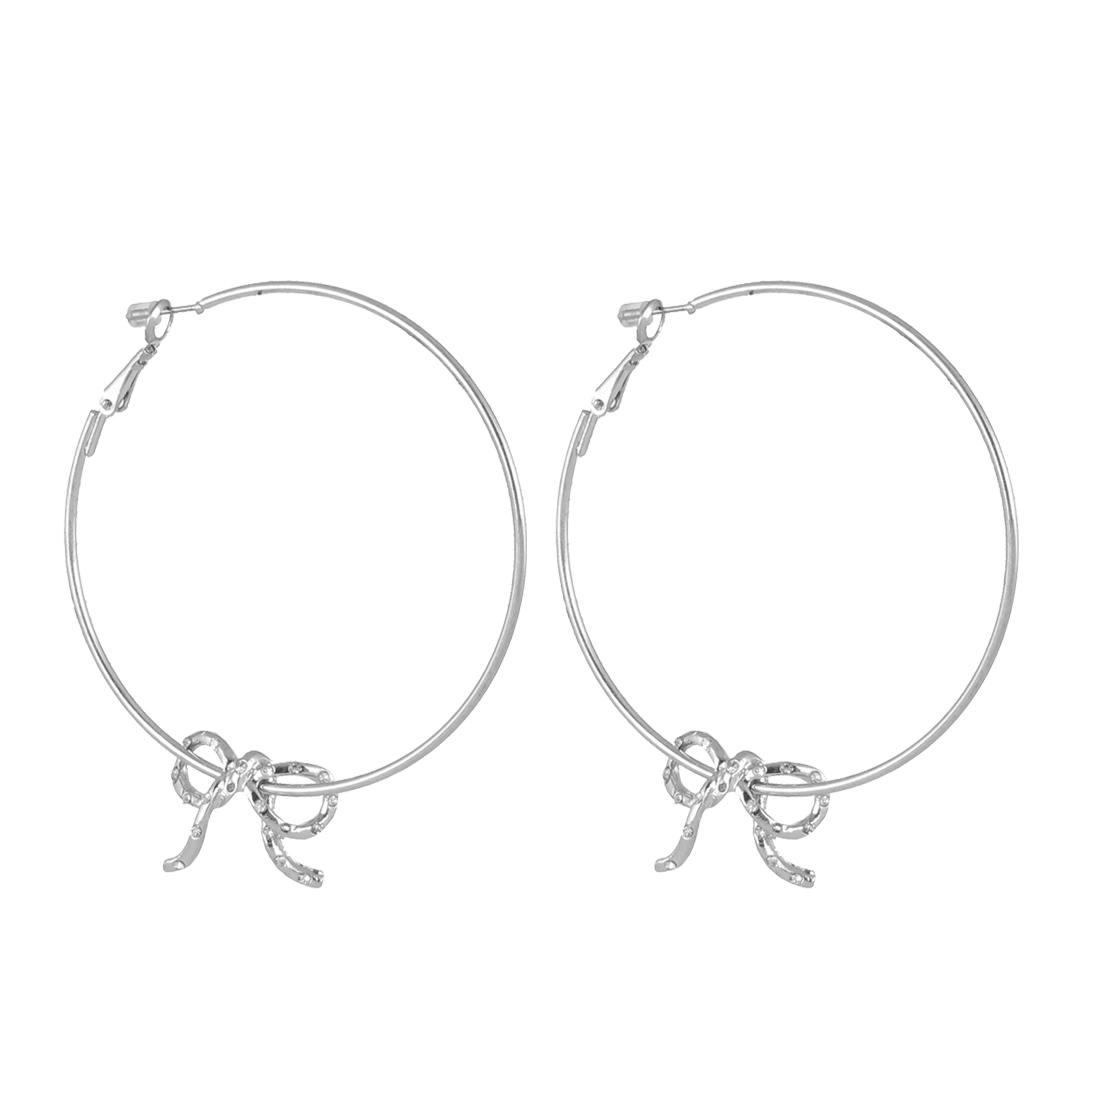 "Lady Women Metal Edge Smooth Circle Running Bowknot Design Hoop Pierced Earrings Silver Tone 2.4"" Dia Pair"